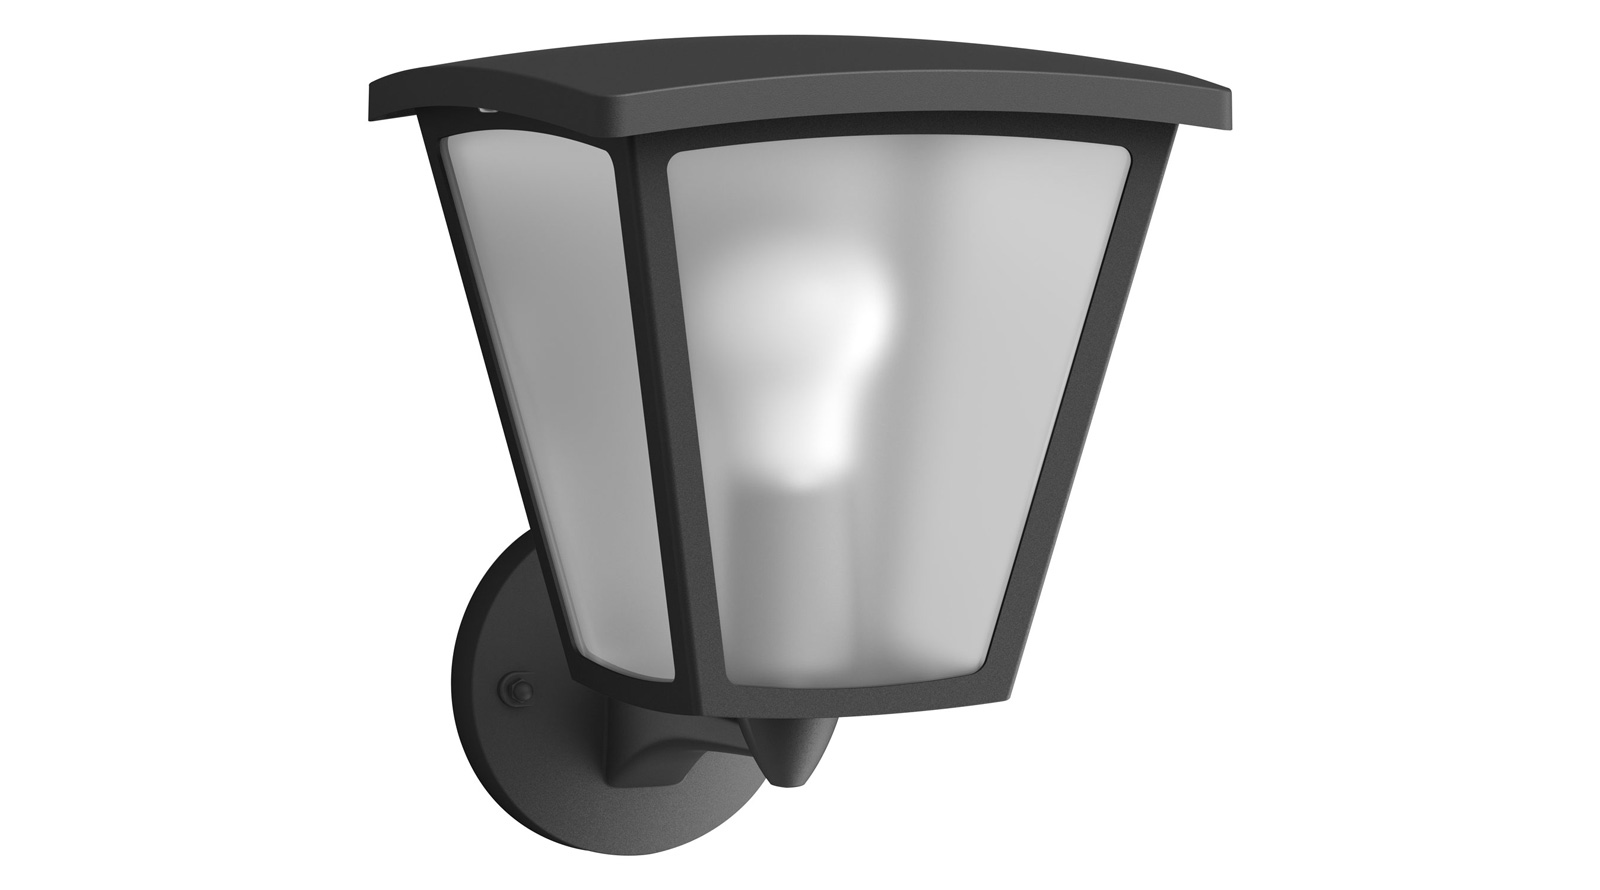 Philips hue inara smart outdoor wall light homekit news and reviews aloadofball Choice Image